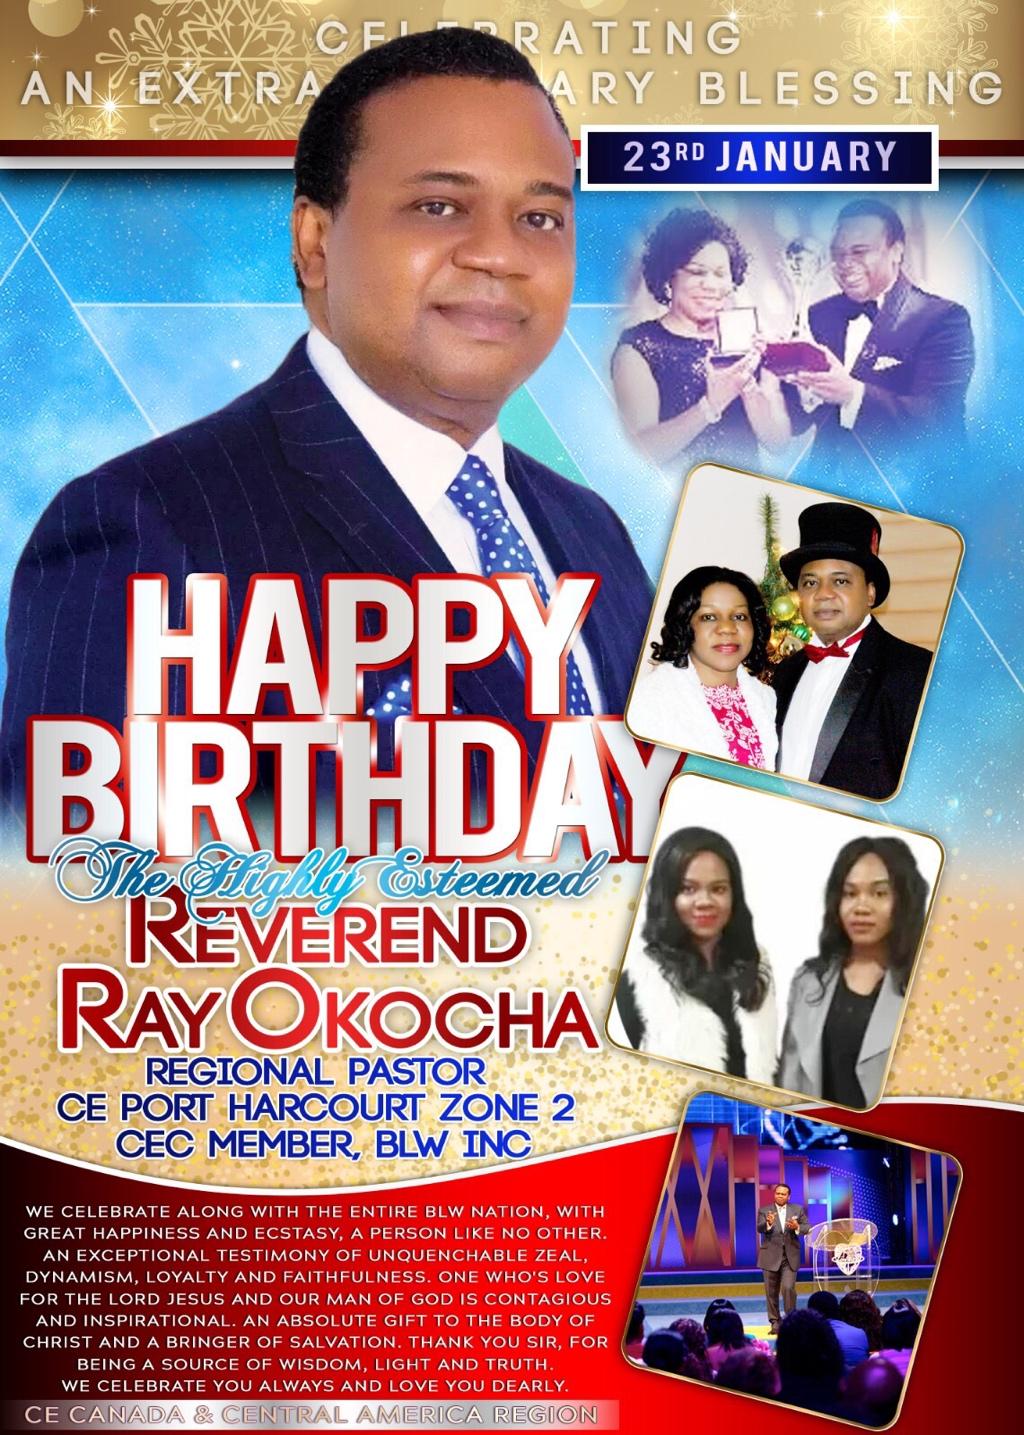 Happy Birthday Reverend Sir, thank